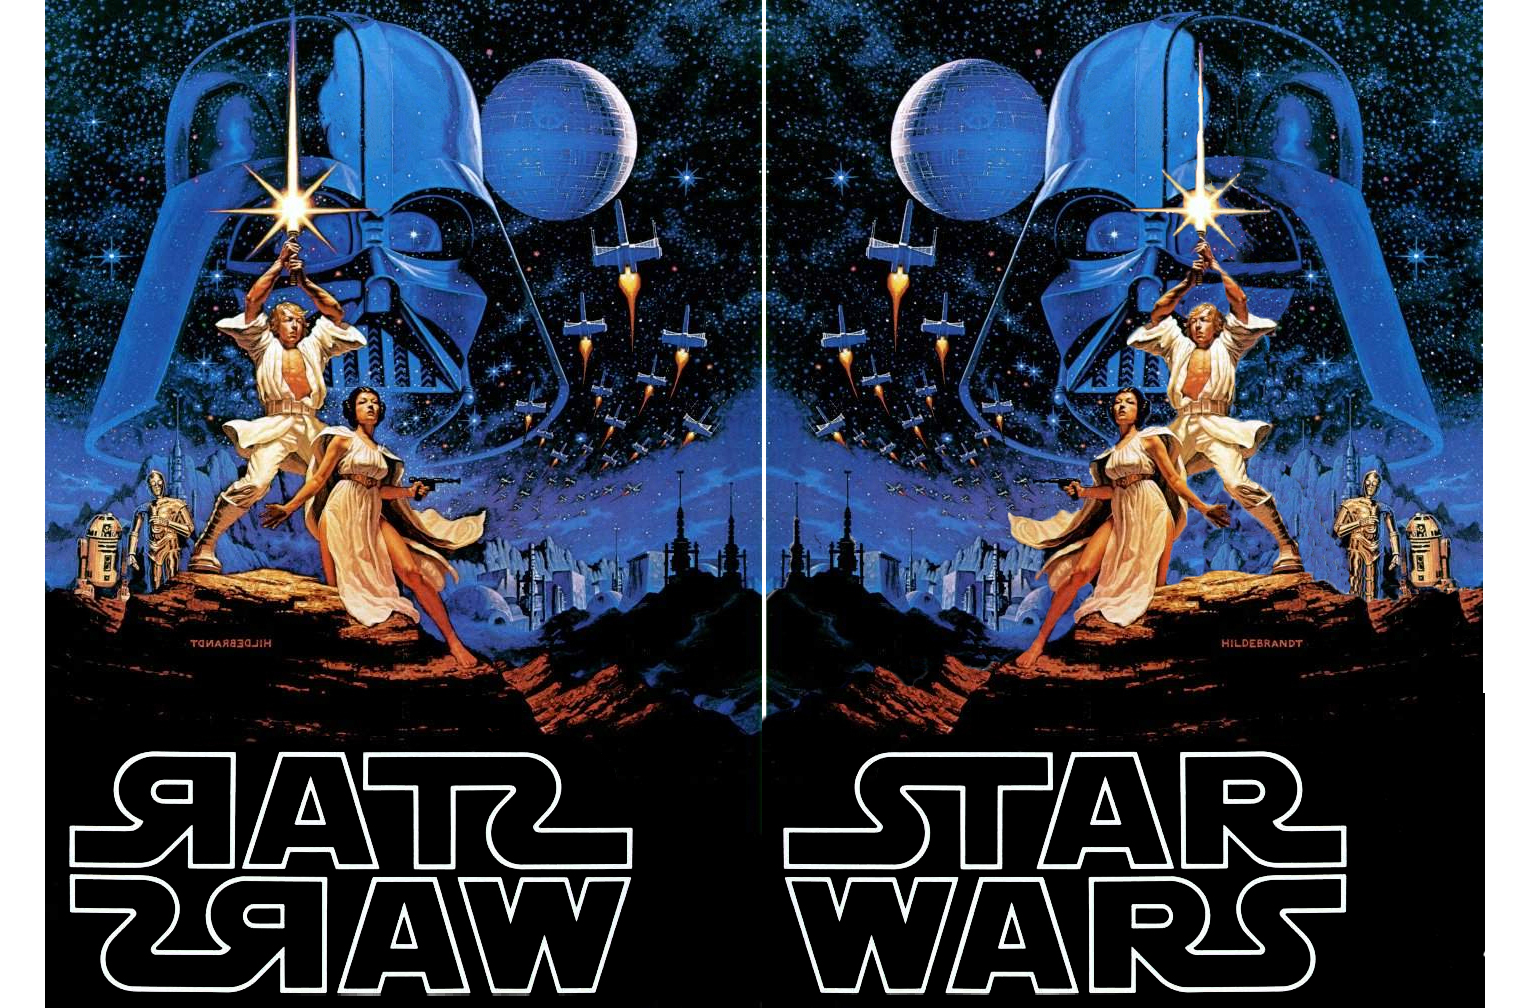 Star wars 3d by garbagestar on deviantart for 3d star net